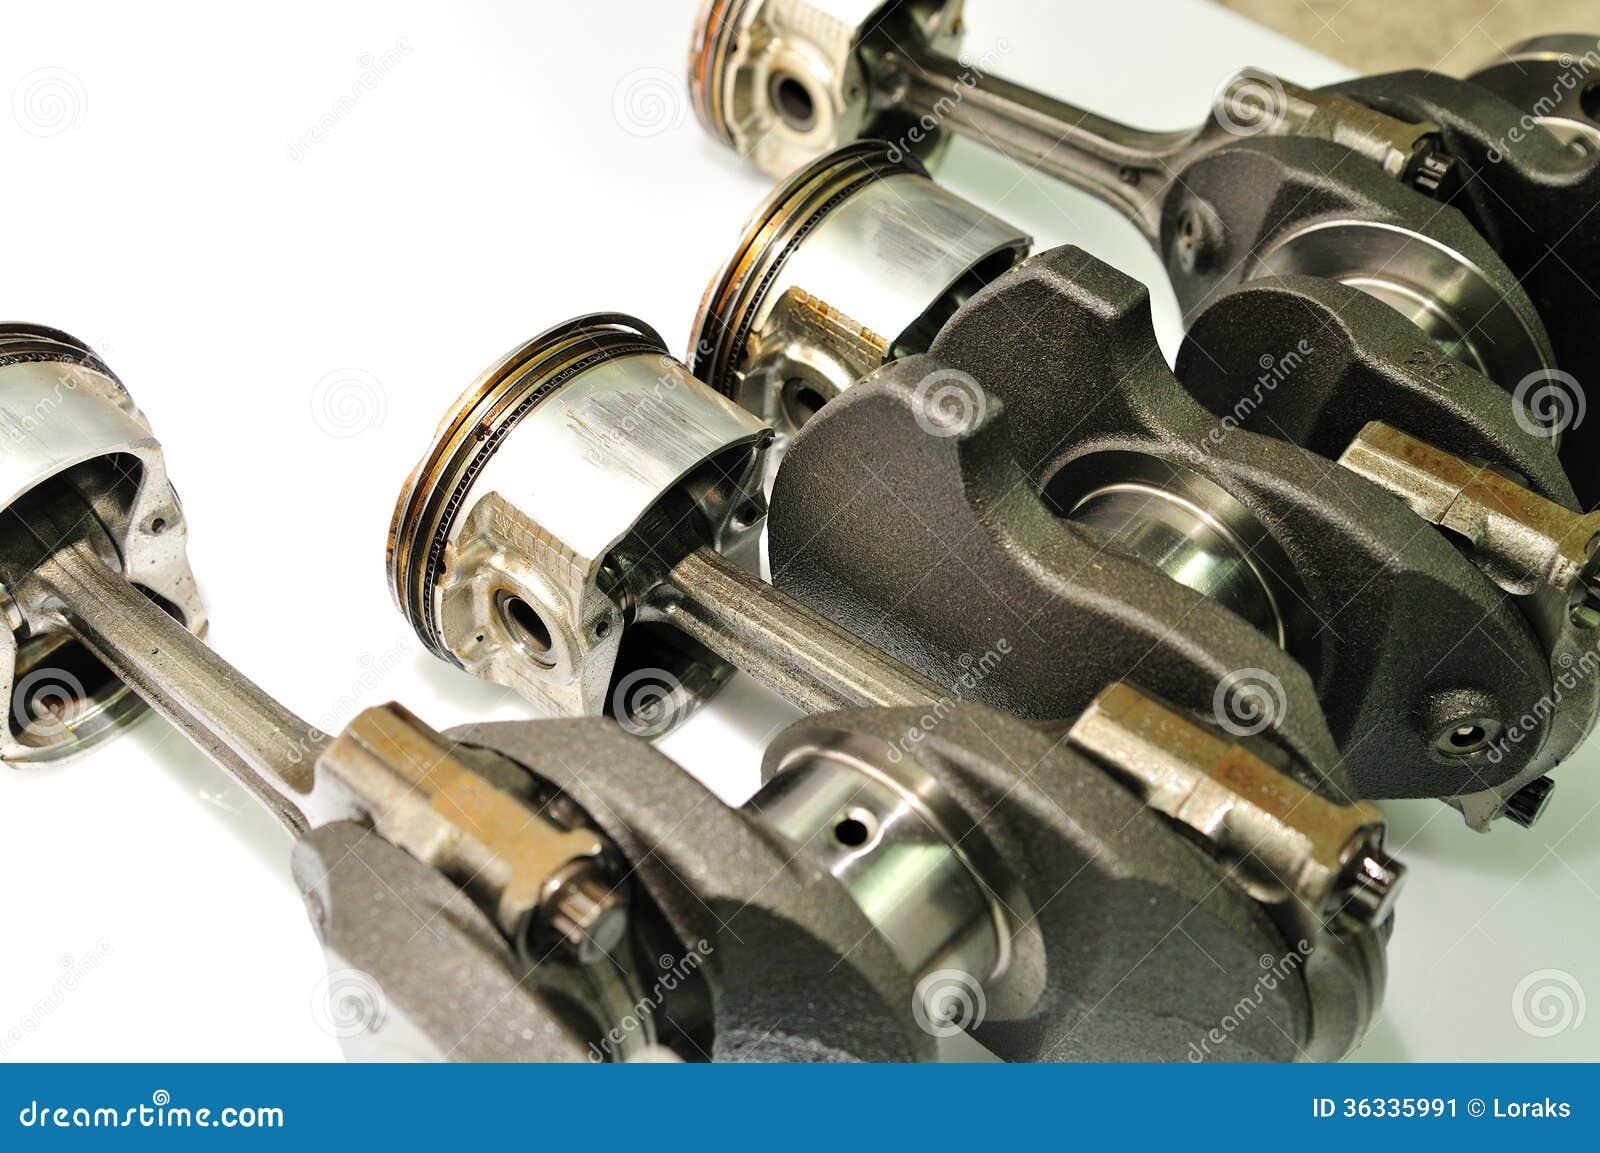 car worn crankshaft with damaged pistons stock image image of metallic engine 36335991. Black Bedroom Furniture Sets. Home Design Ideas